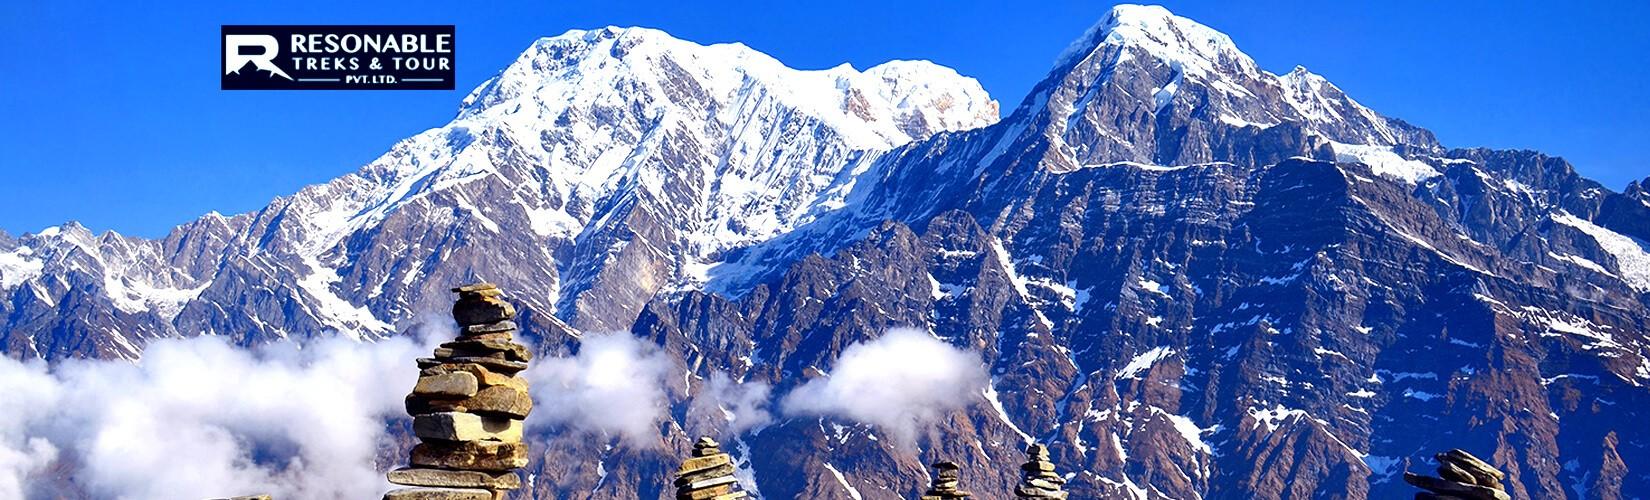 Mardi Himal Trekking | Reasonable Treks and Tour | Trekking in Nepal